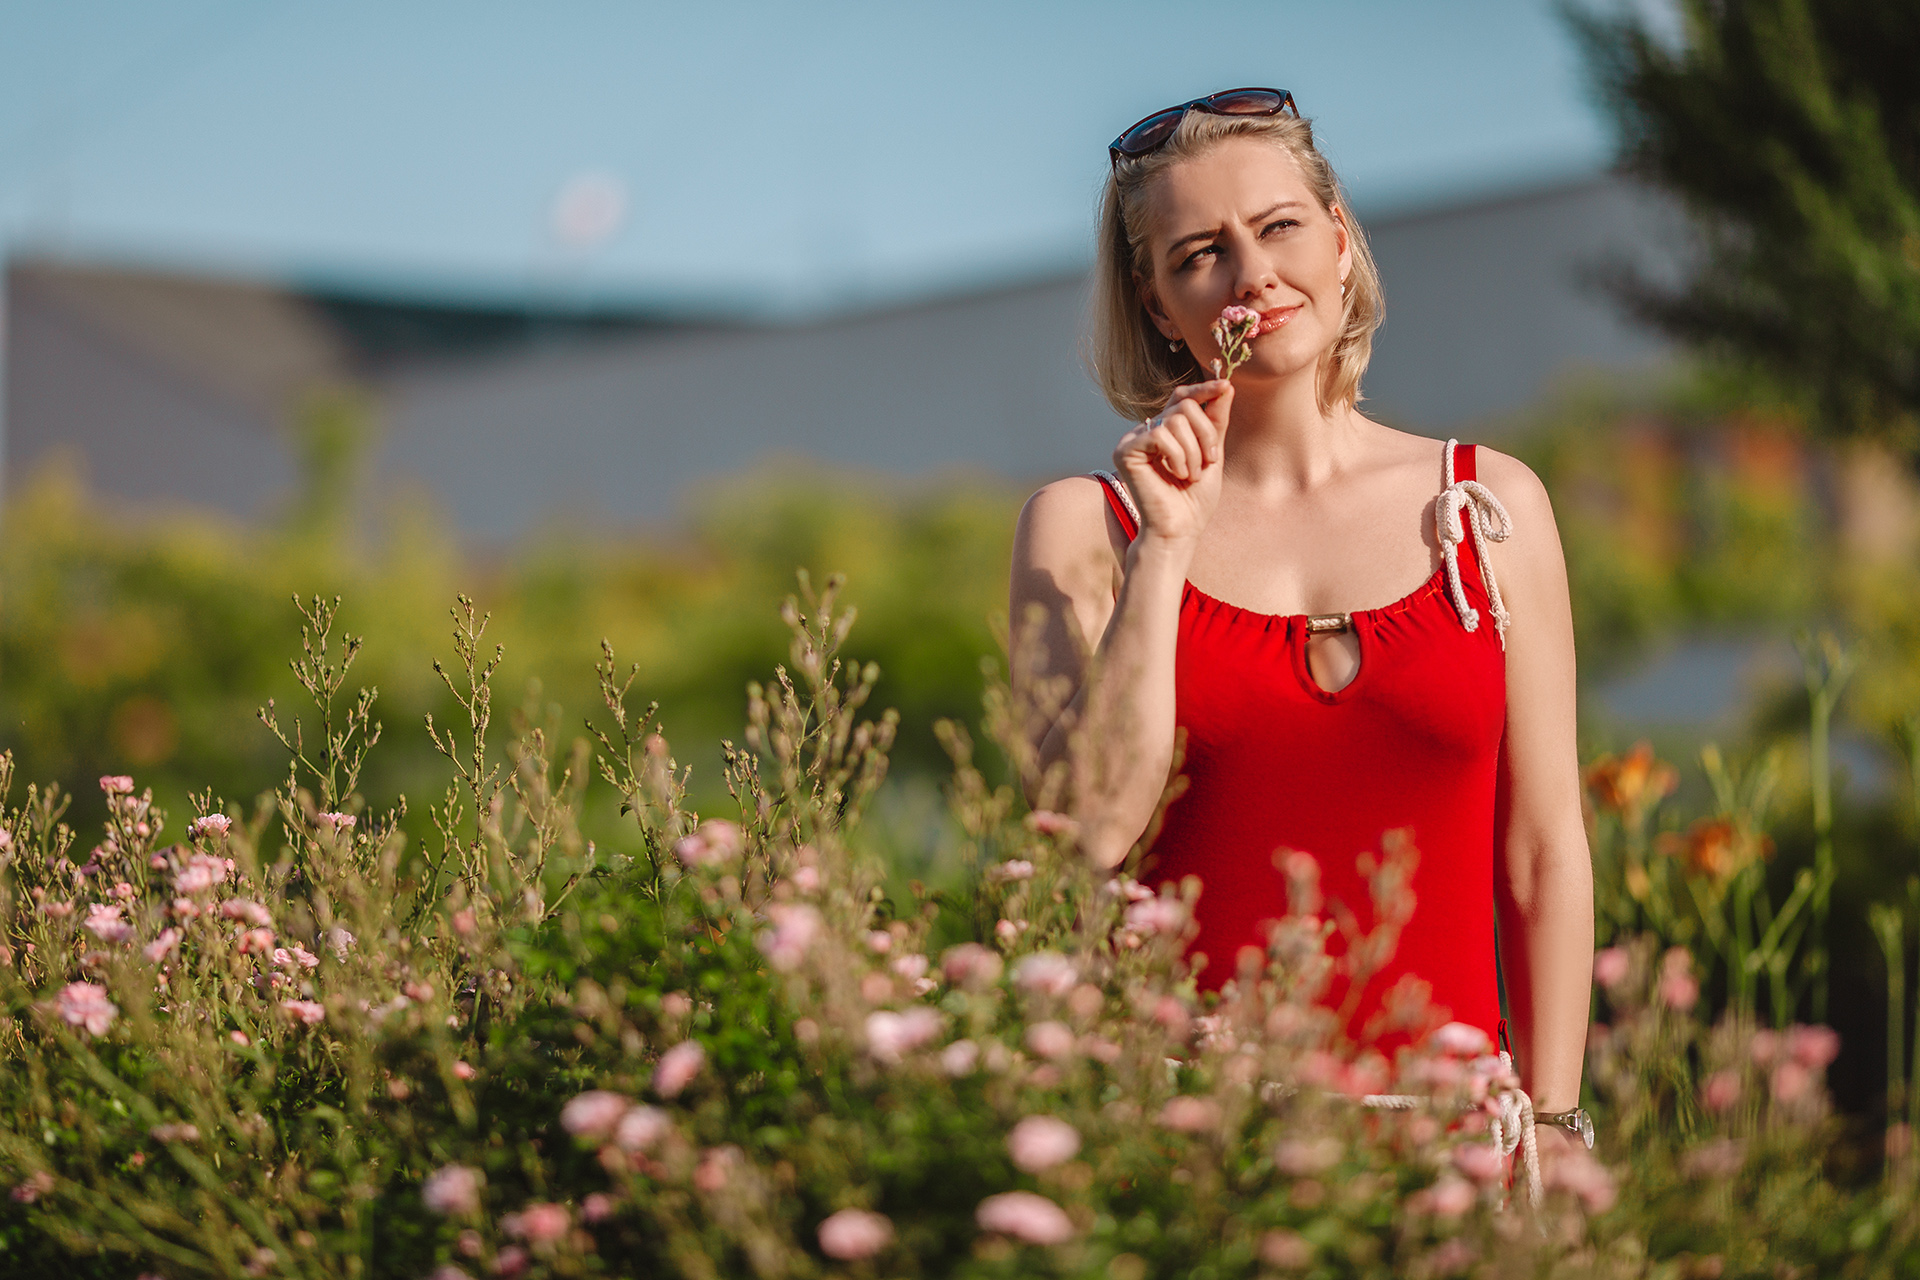 Ahoj/Szia cover girl Alexandra - Kristian Marko photography